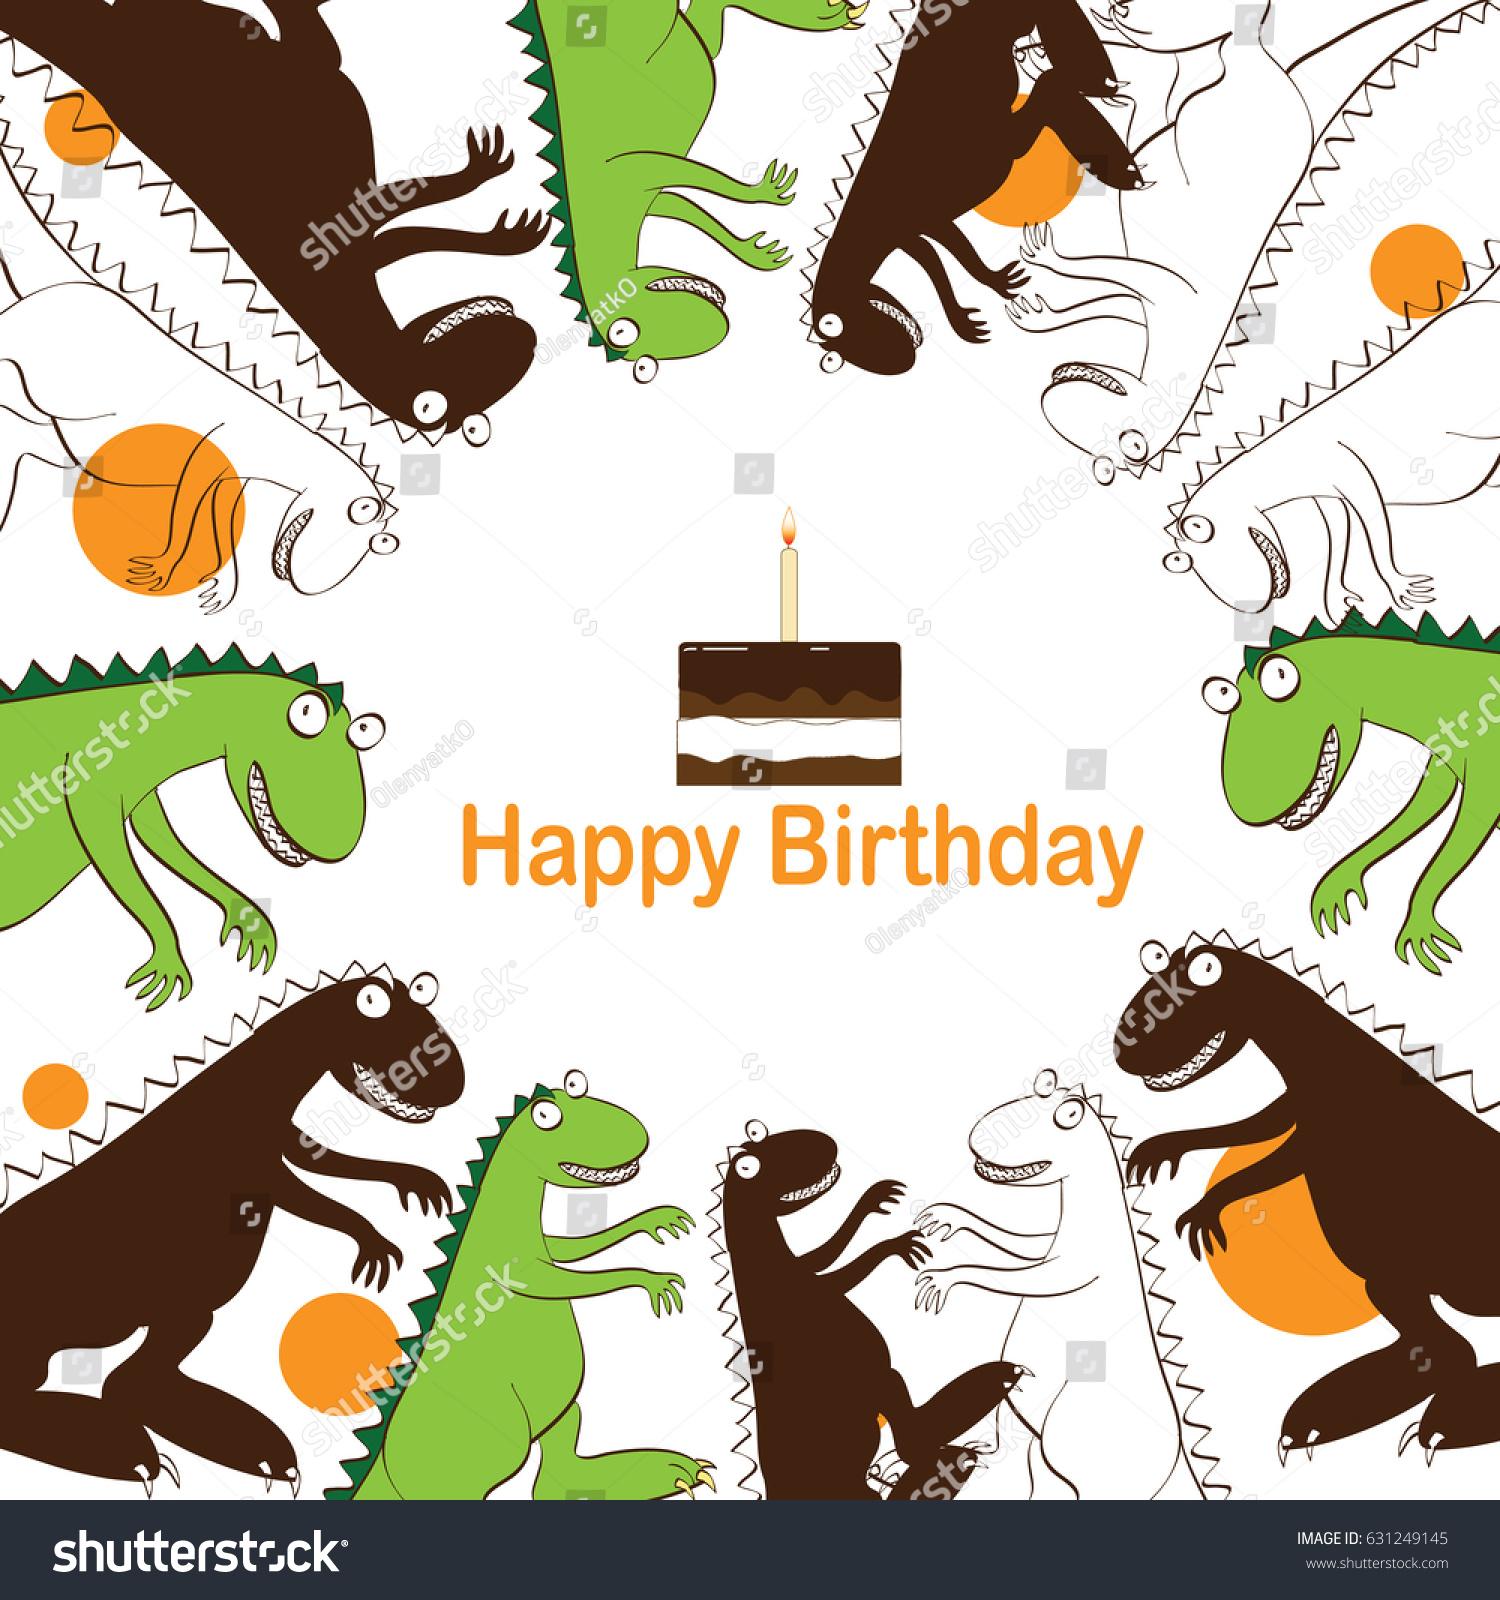 Greeting Card Card Invitations Birthday Dinosaurs Stock Illustration ...